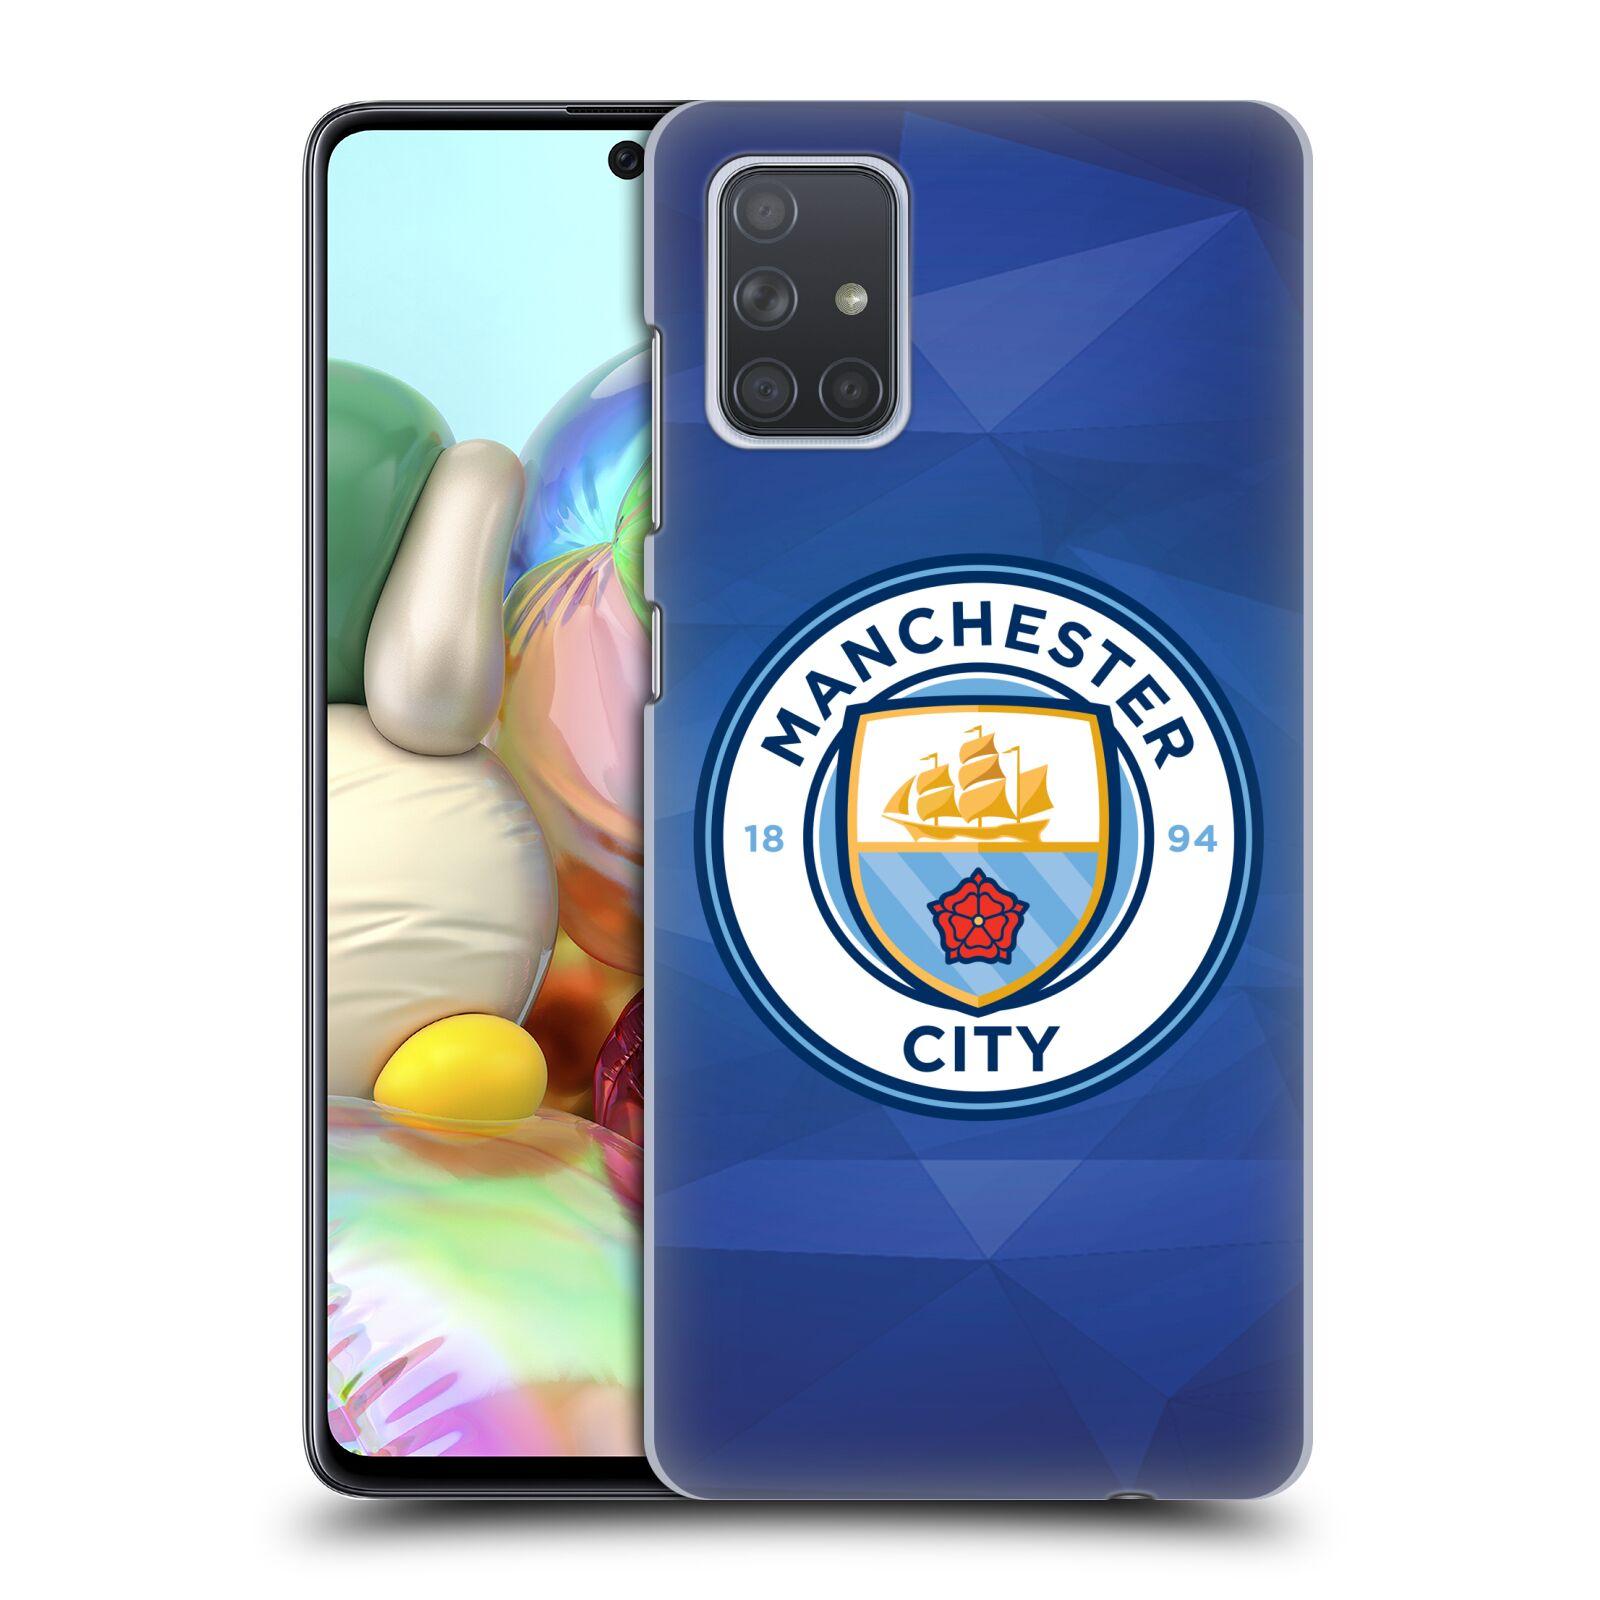 Plastové pouzdro na mobil Samsung Galaxy A71 - Head Case - Manchester City FC - Modré nové logo